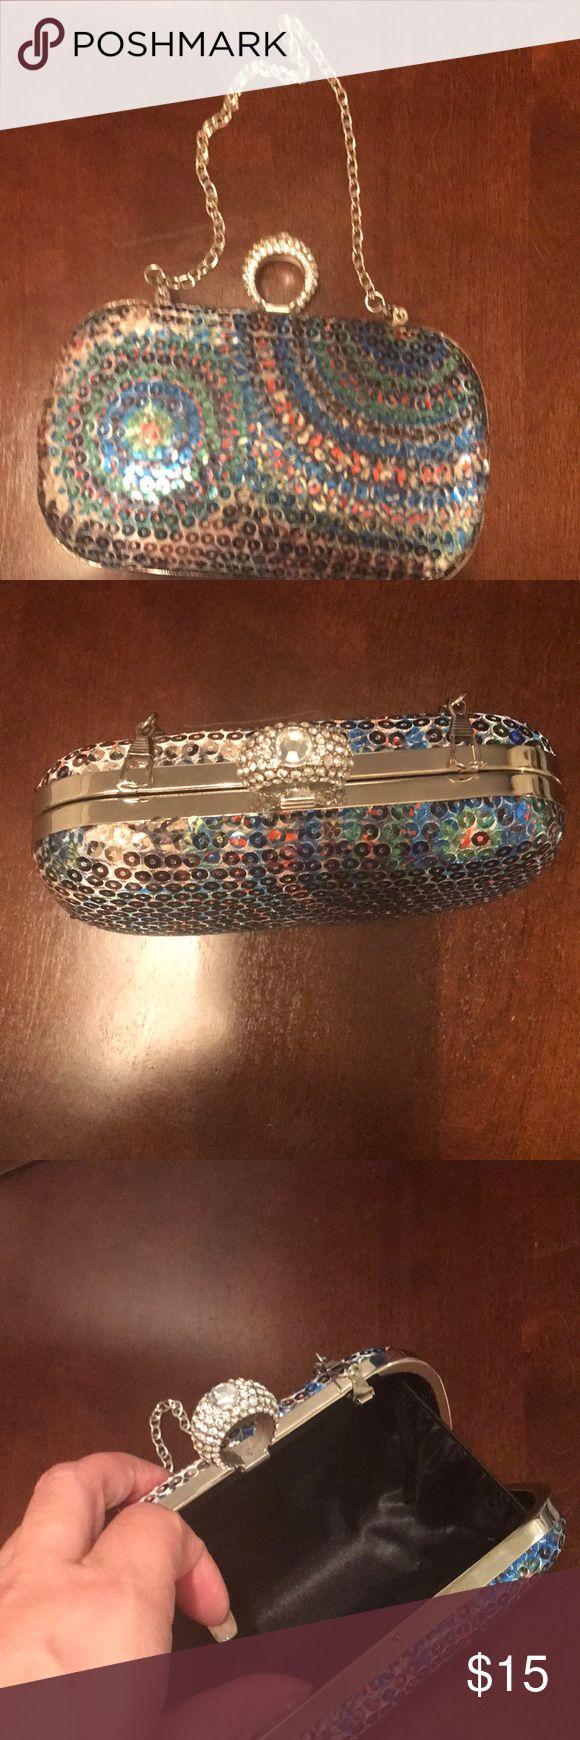 New Multi color clutch New multi color clutch—light blue,lime green,royal blue,rhinestone stone ring Bags Clutches & Wristlets